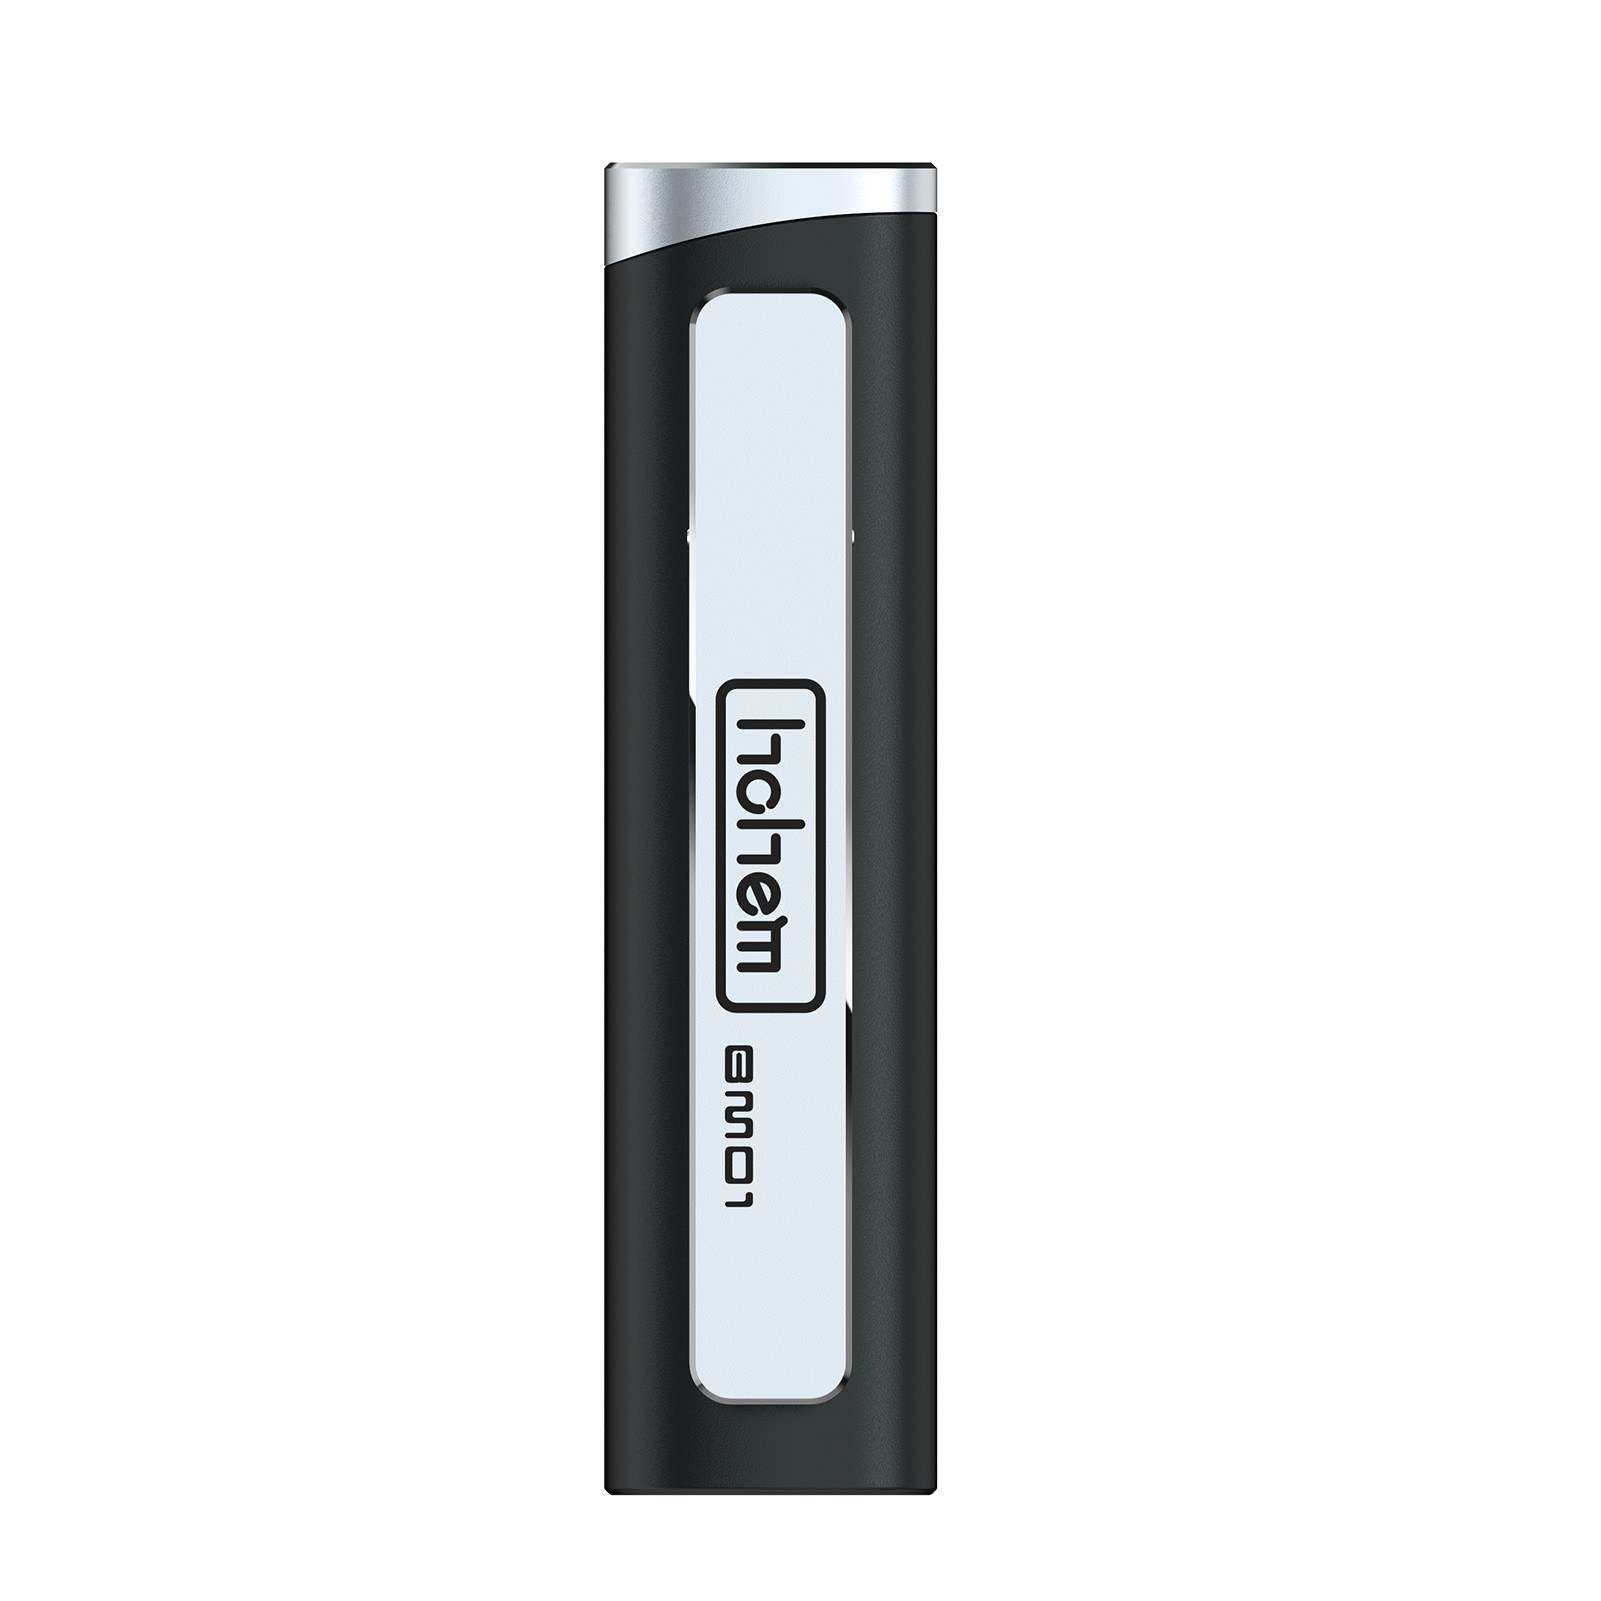 Hohem BM01 Wireless Lavalier Microphone with